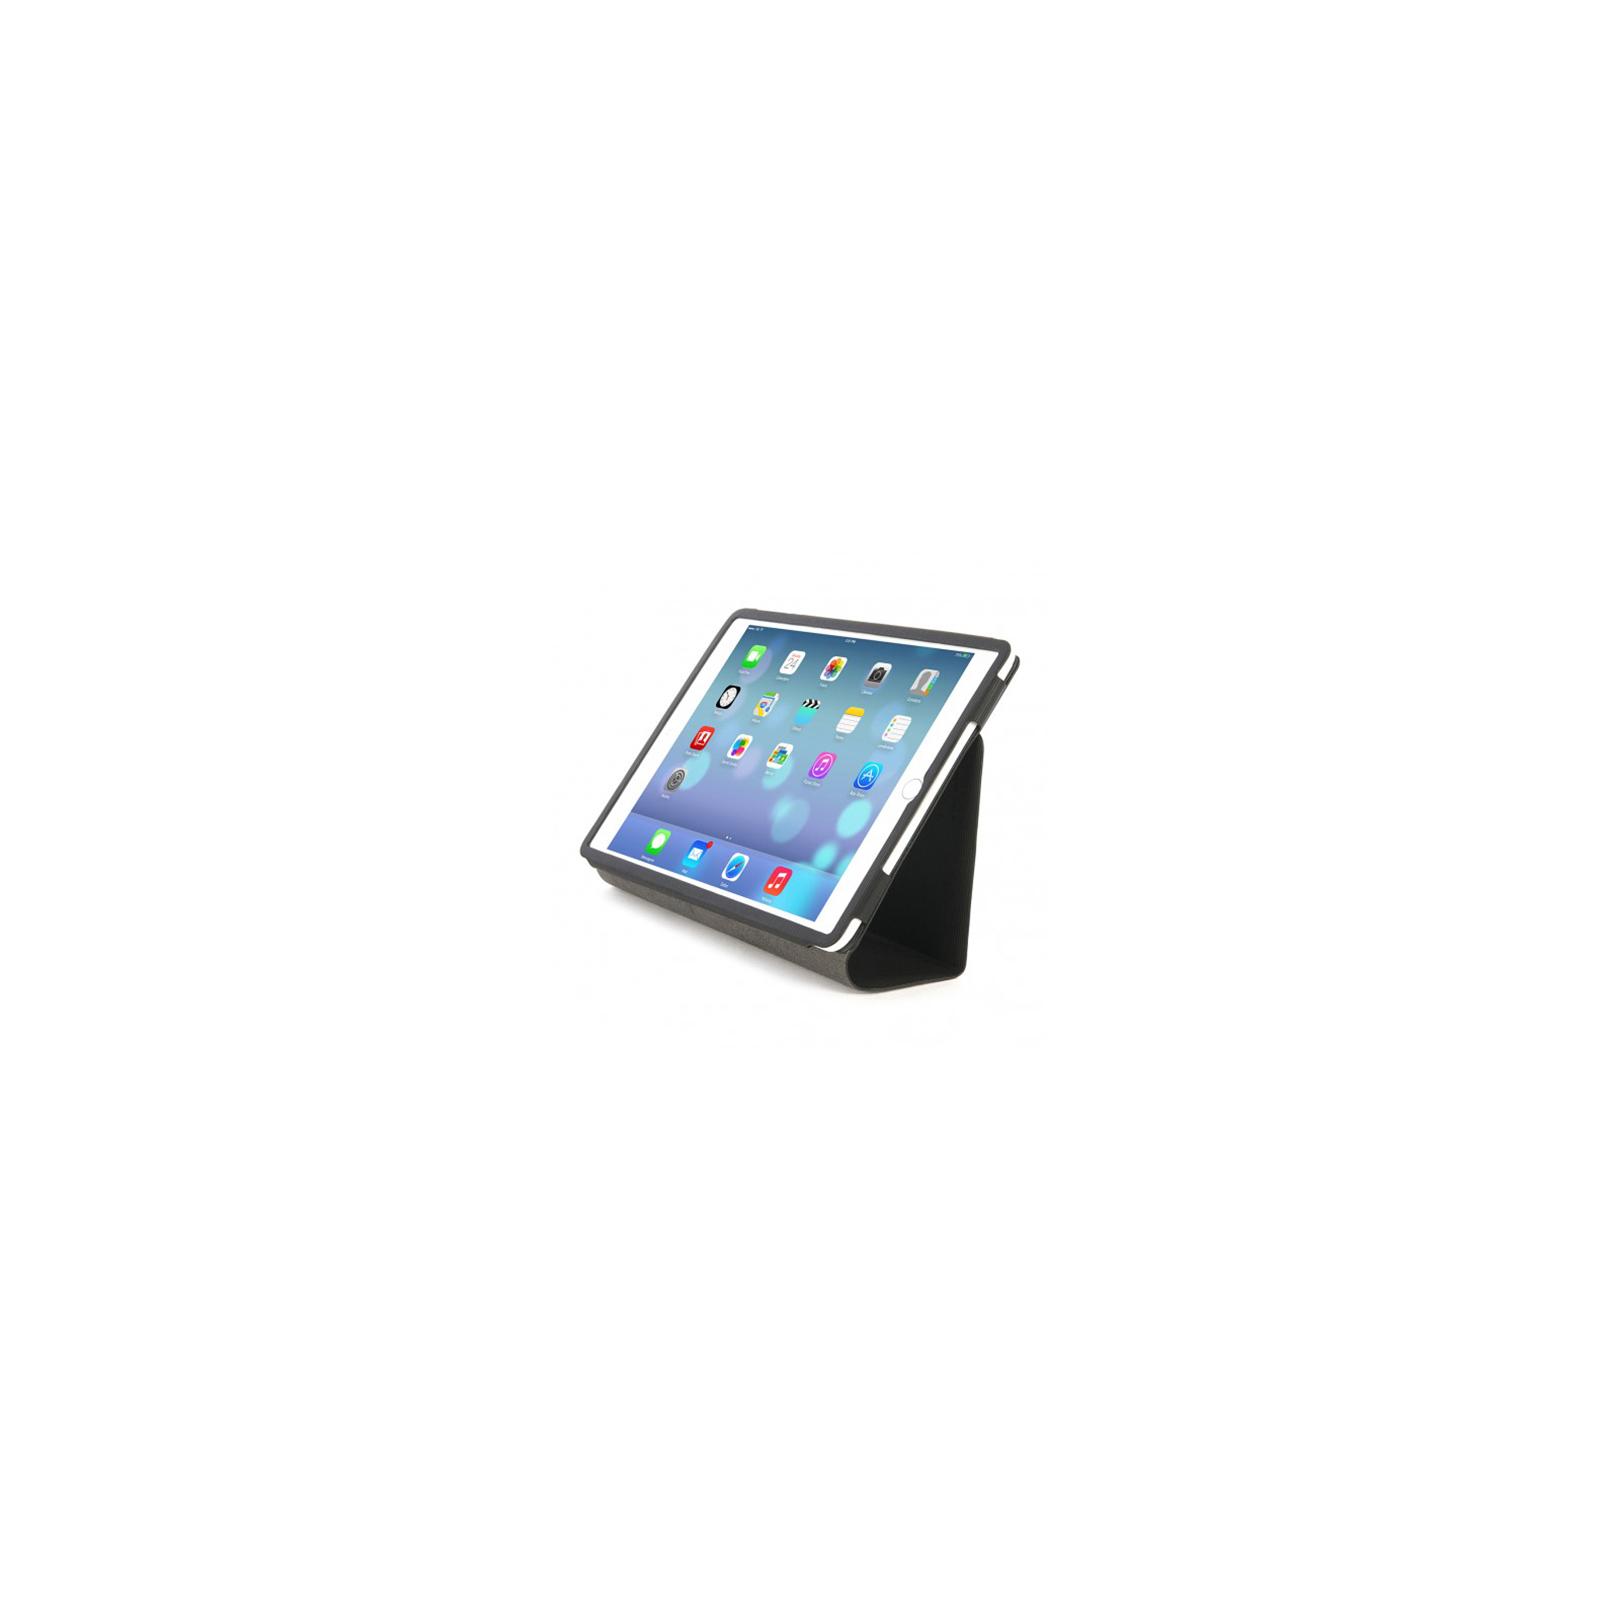 Чехол для планшета Tucano iPad Air Fresco Black (IPD5F) изображение 3